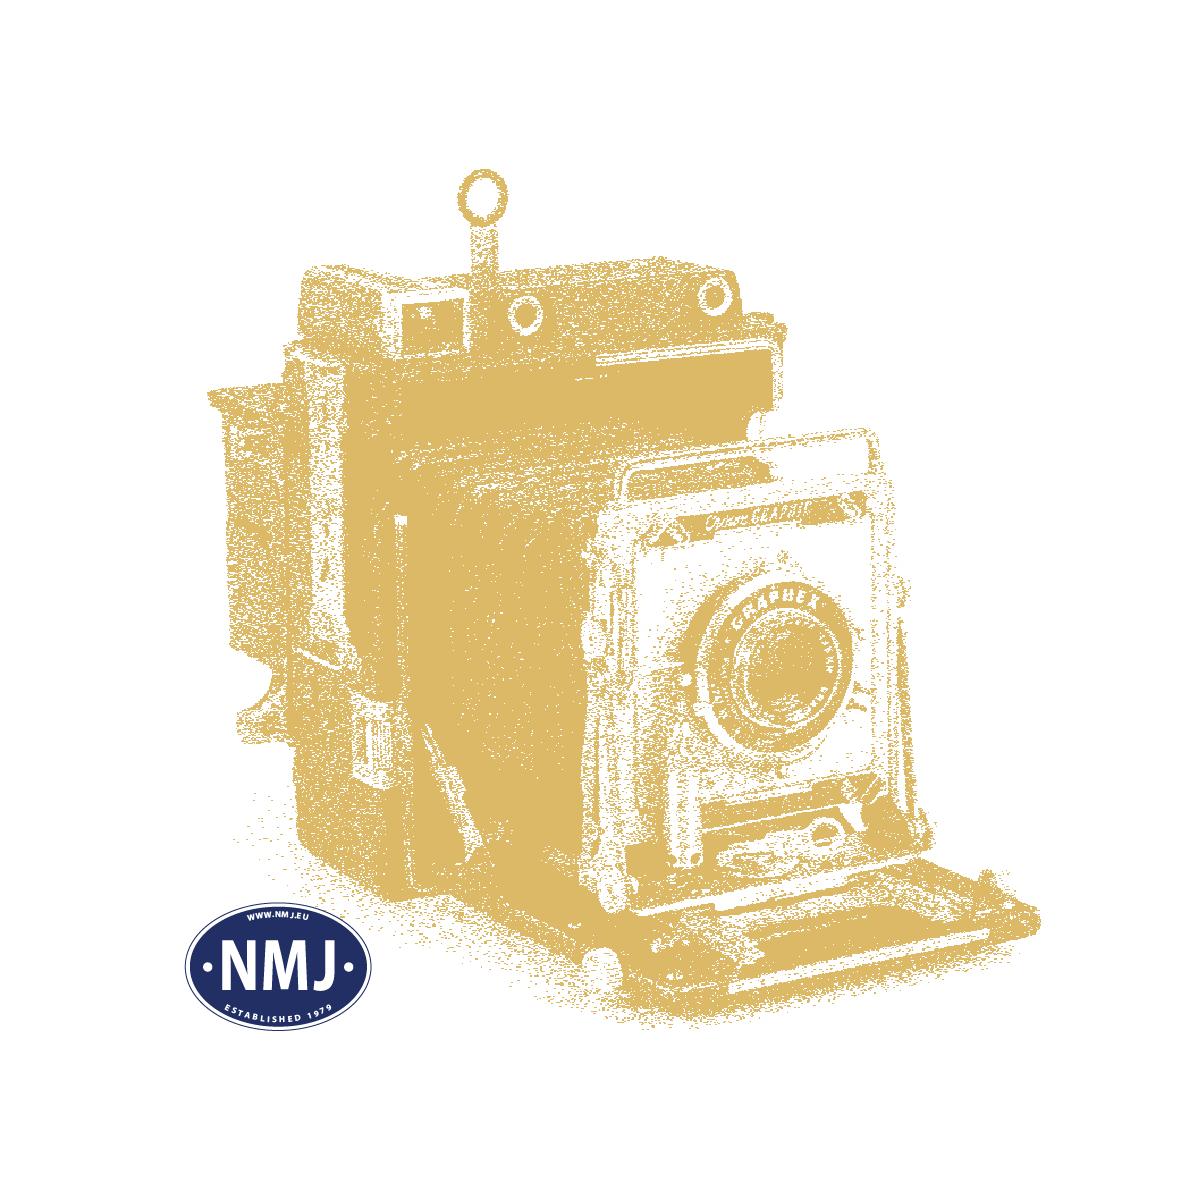 "NMJT87.202AC - NMJ Topline NSB El 11b.2145 ""Gullkalven"", AC Digital"